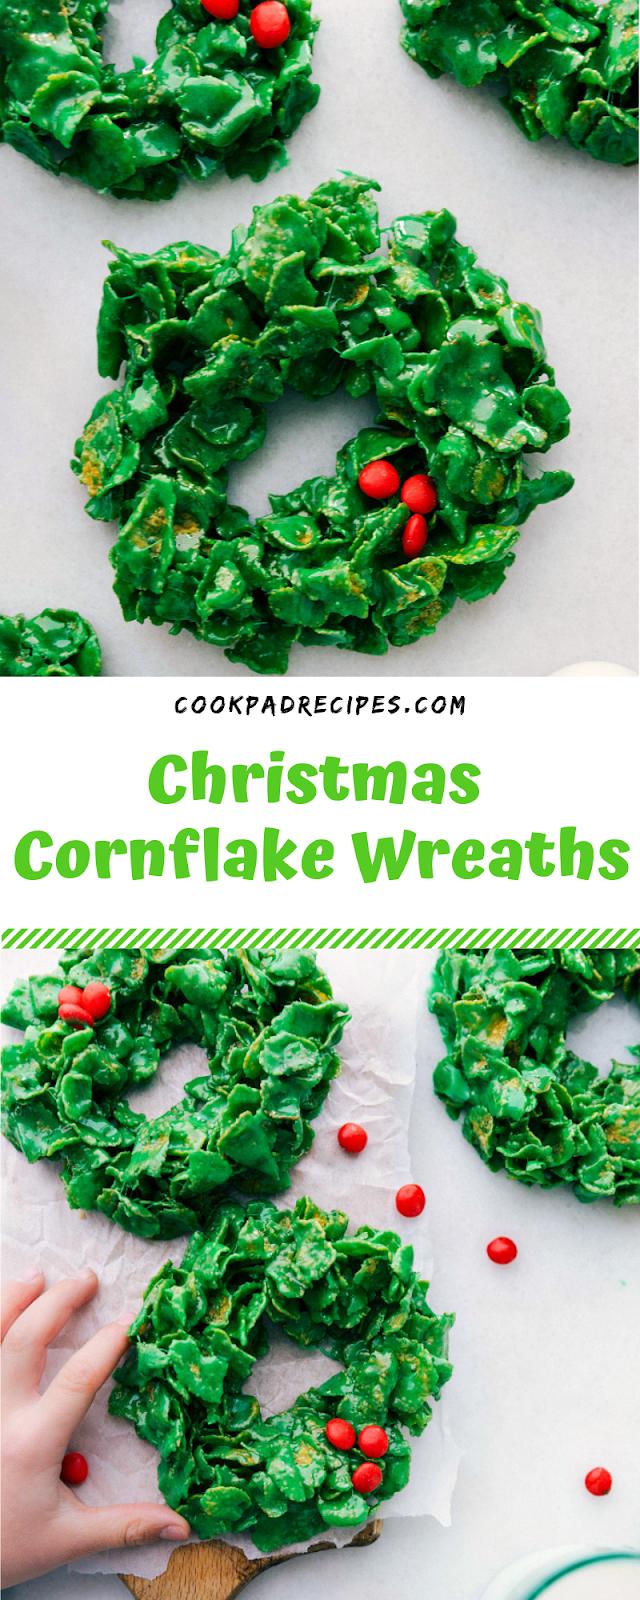 Christmas Cornflake Wreaths #Christmas #Cornflake #Wreaths